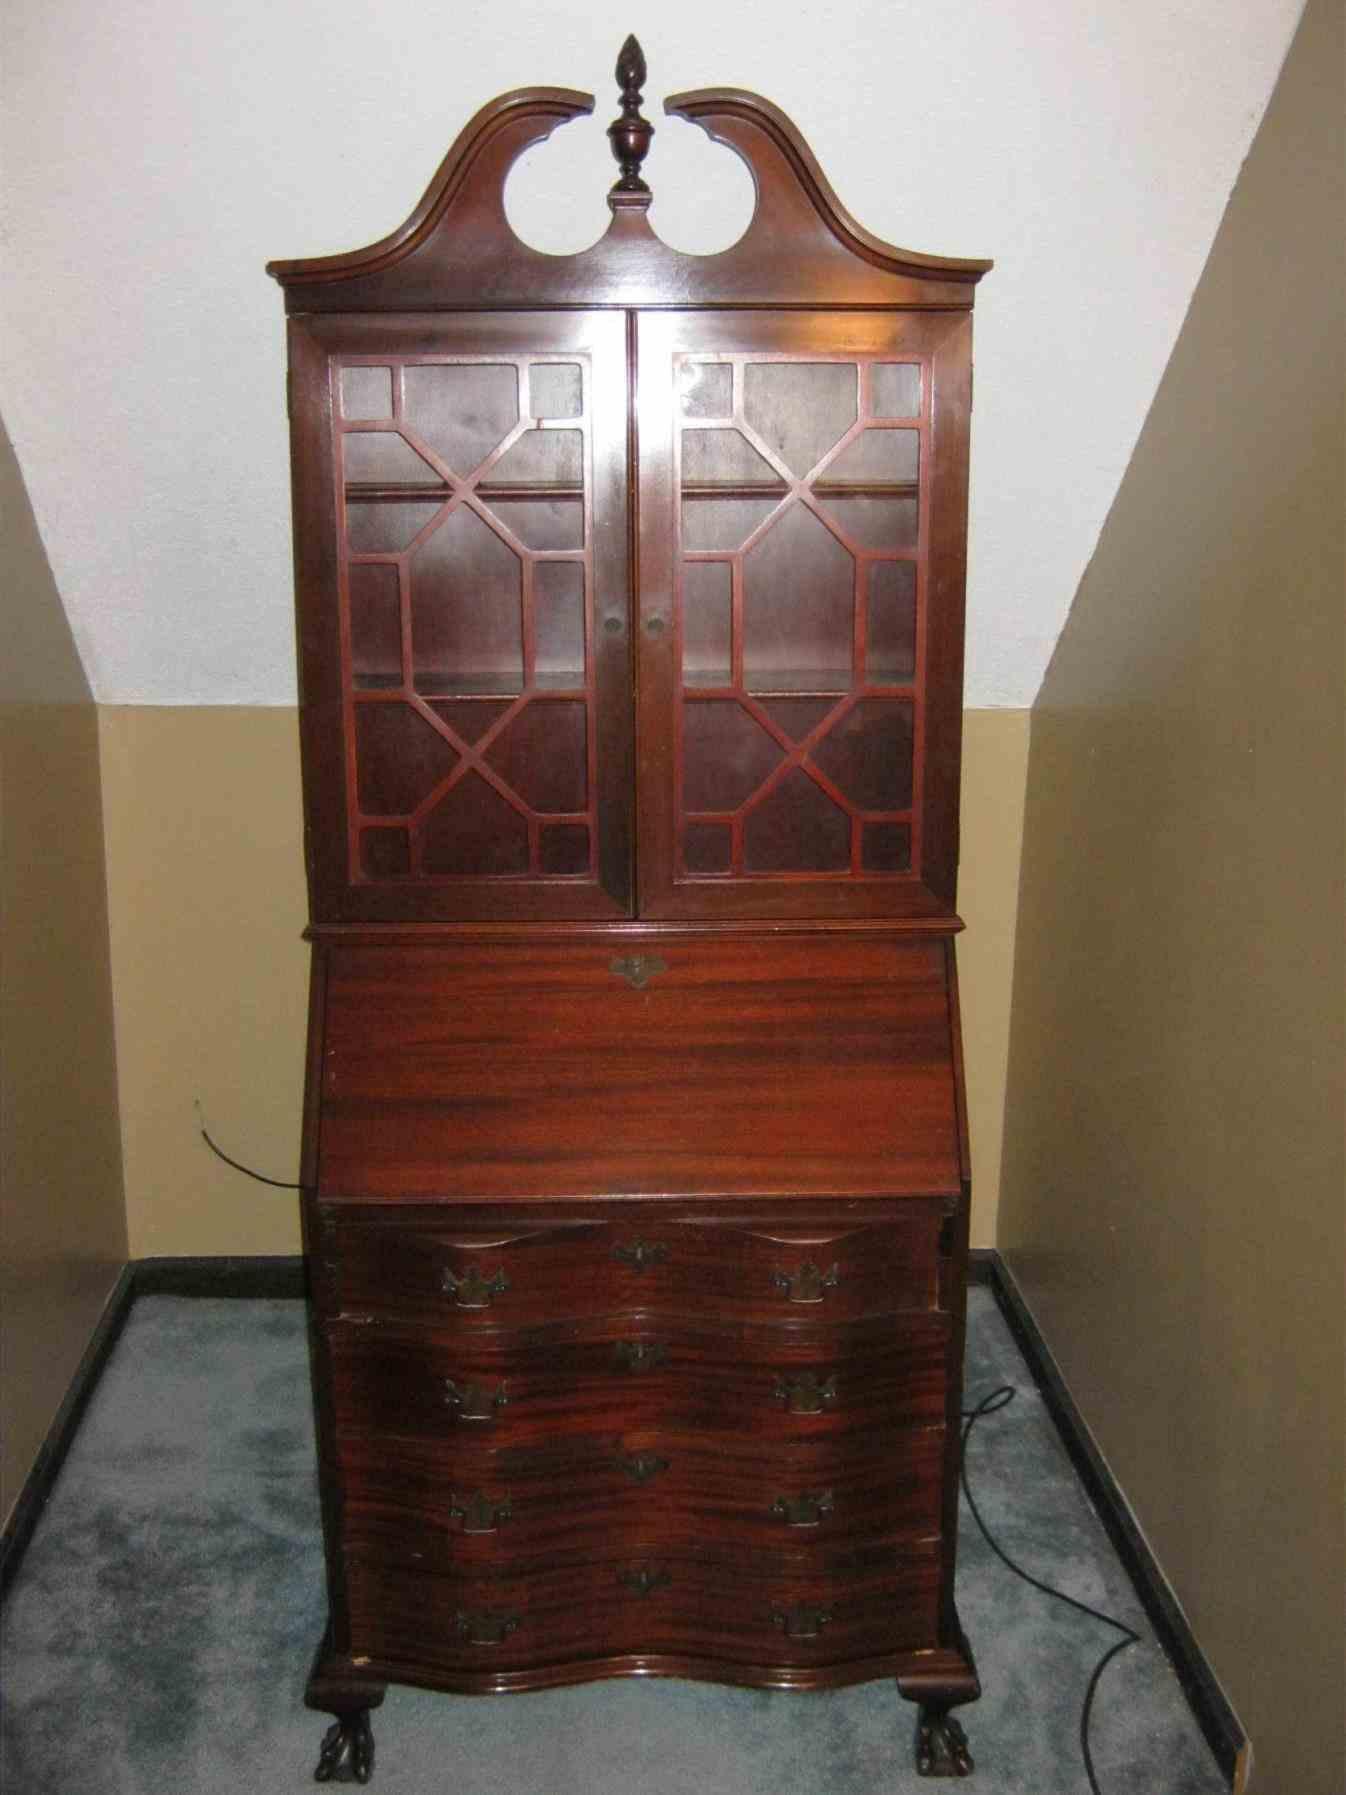 Antique Drop Front Secretary Desk with Bookcase